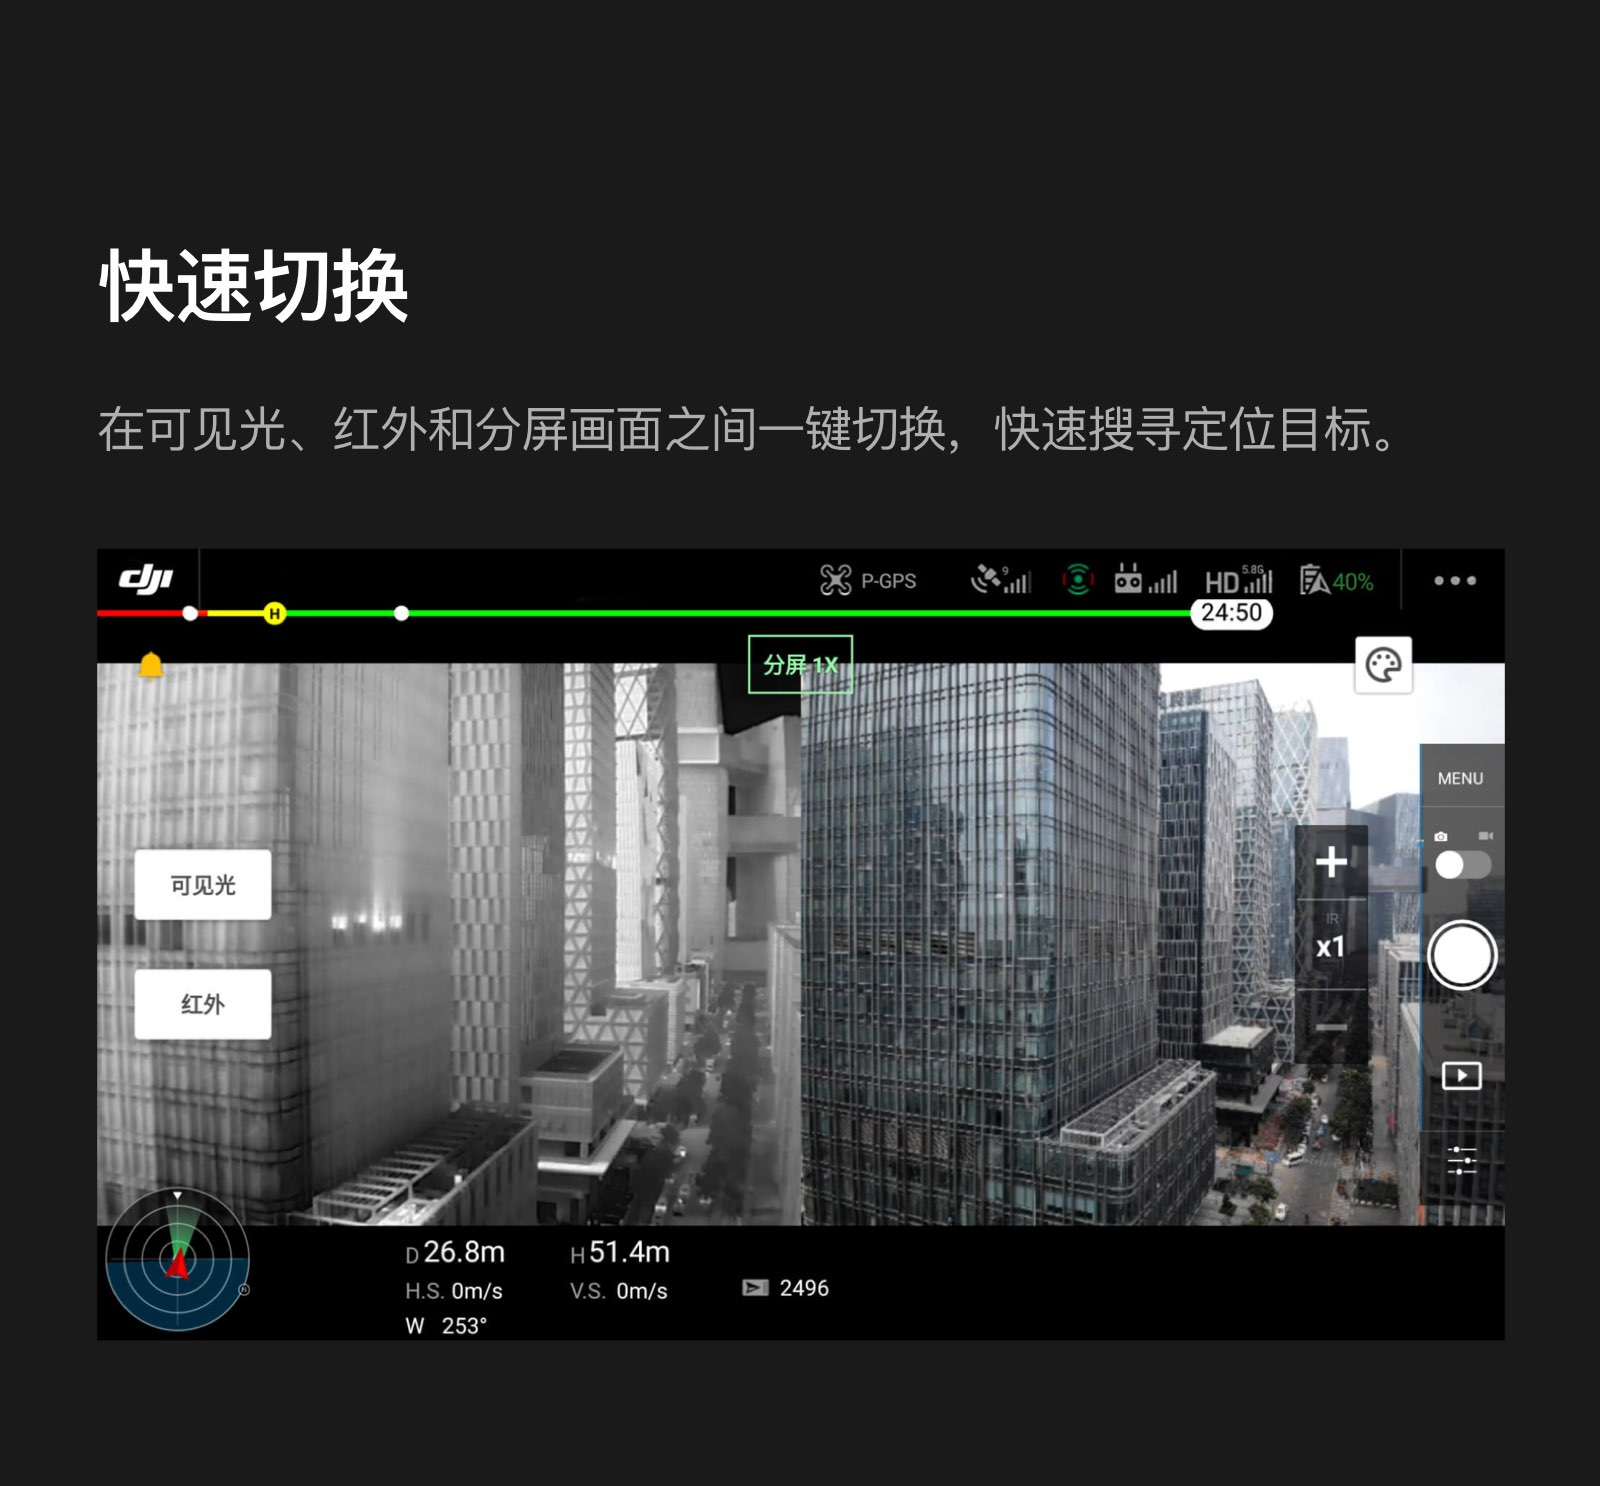 M2EA_PC%20_cn_6.jpg